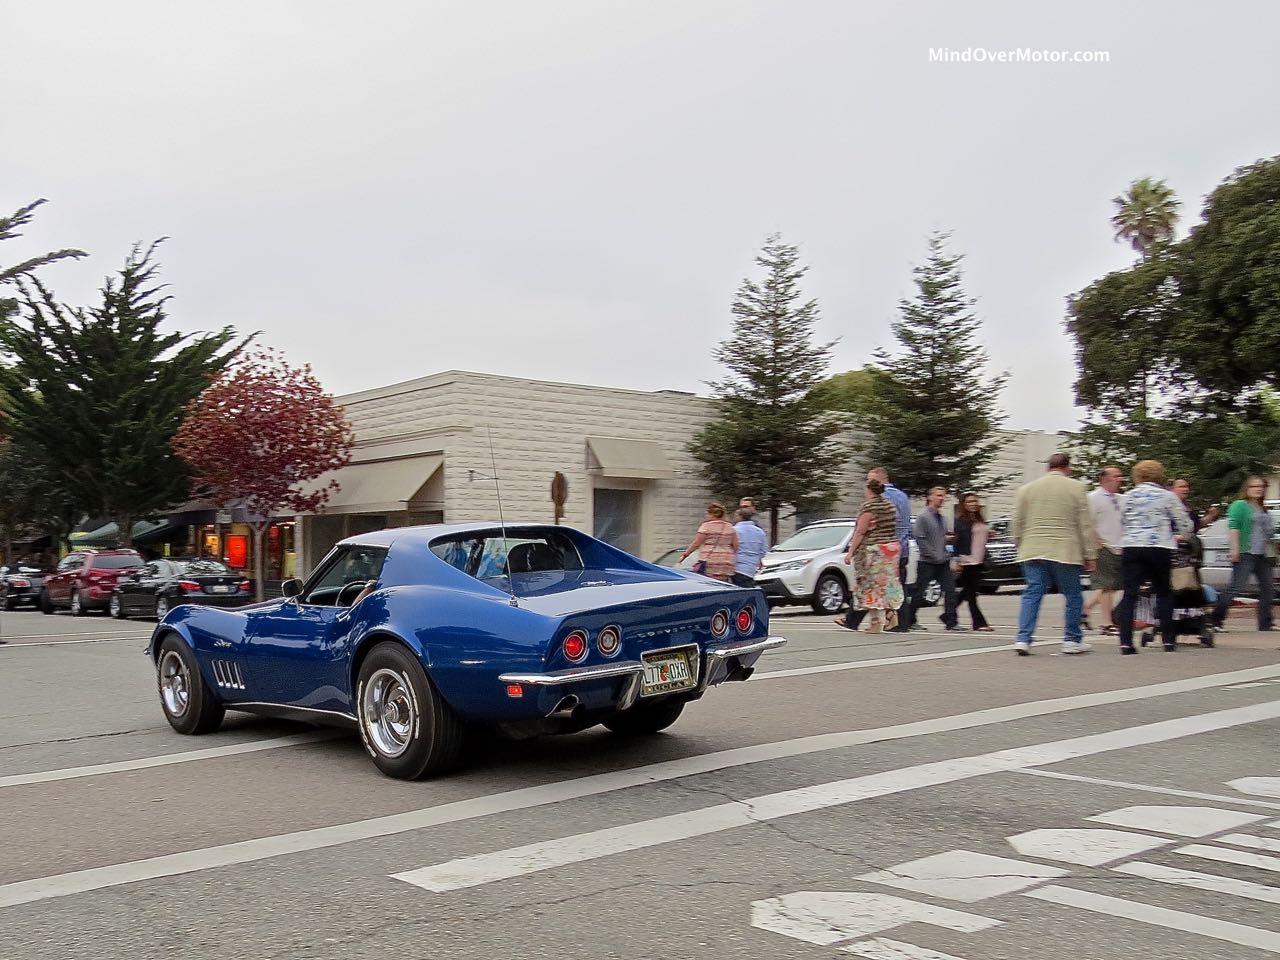 1969 Corvette Rear